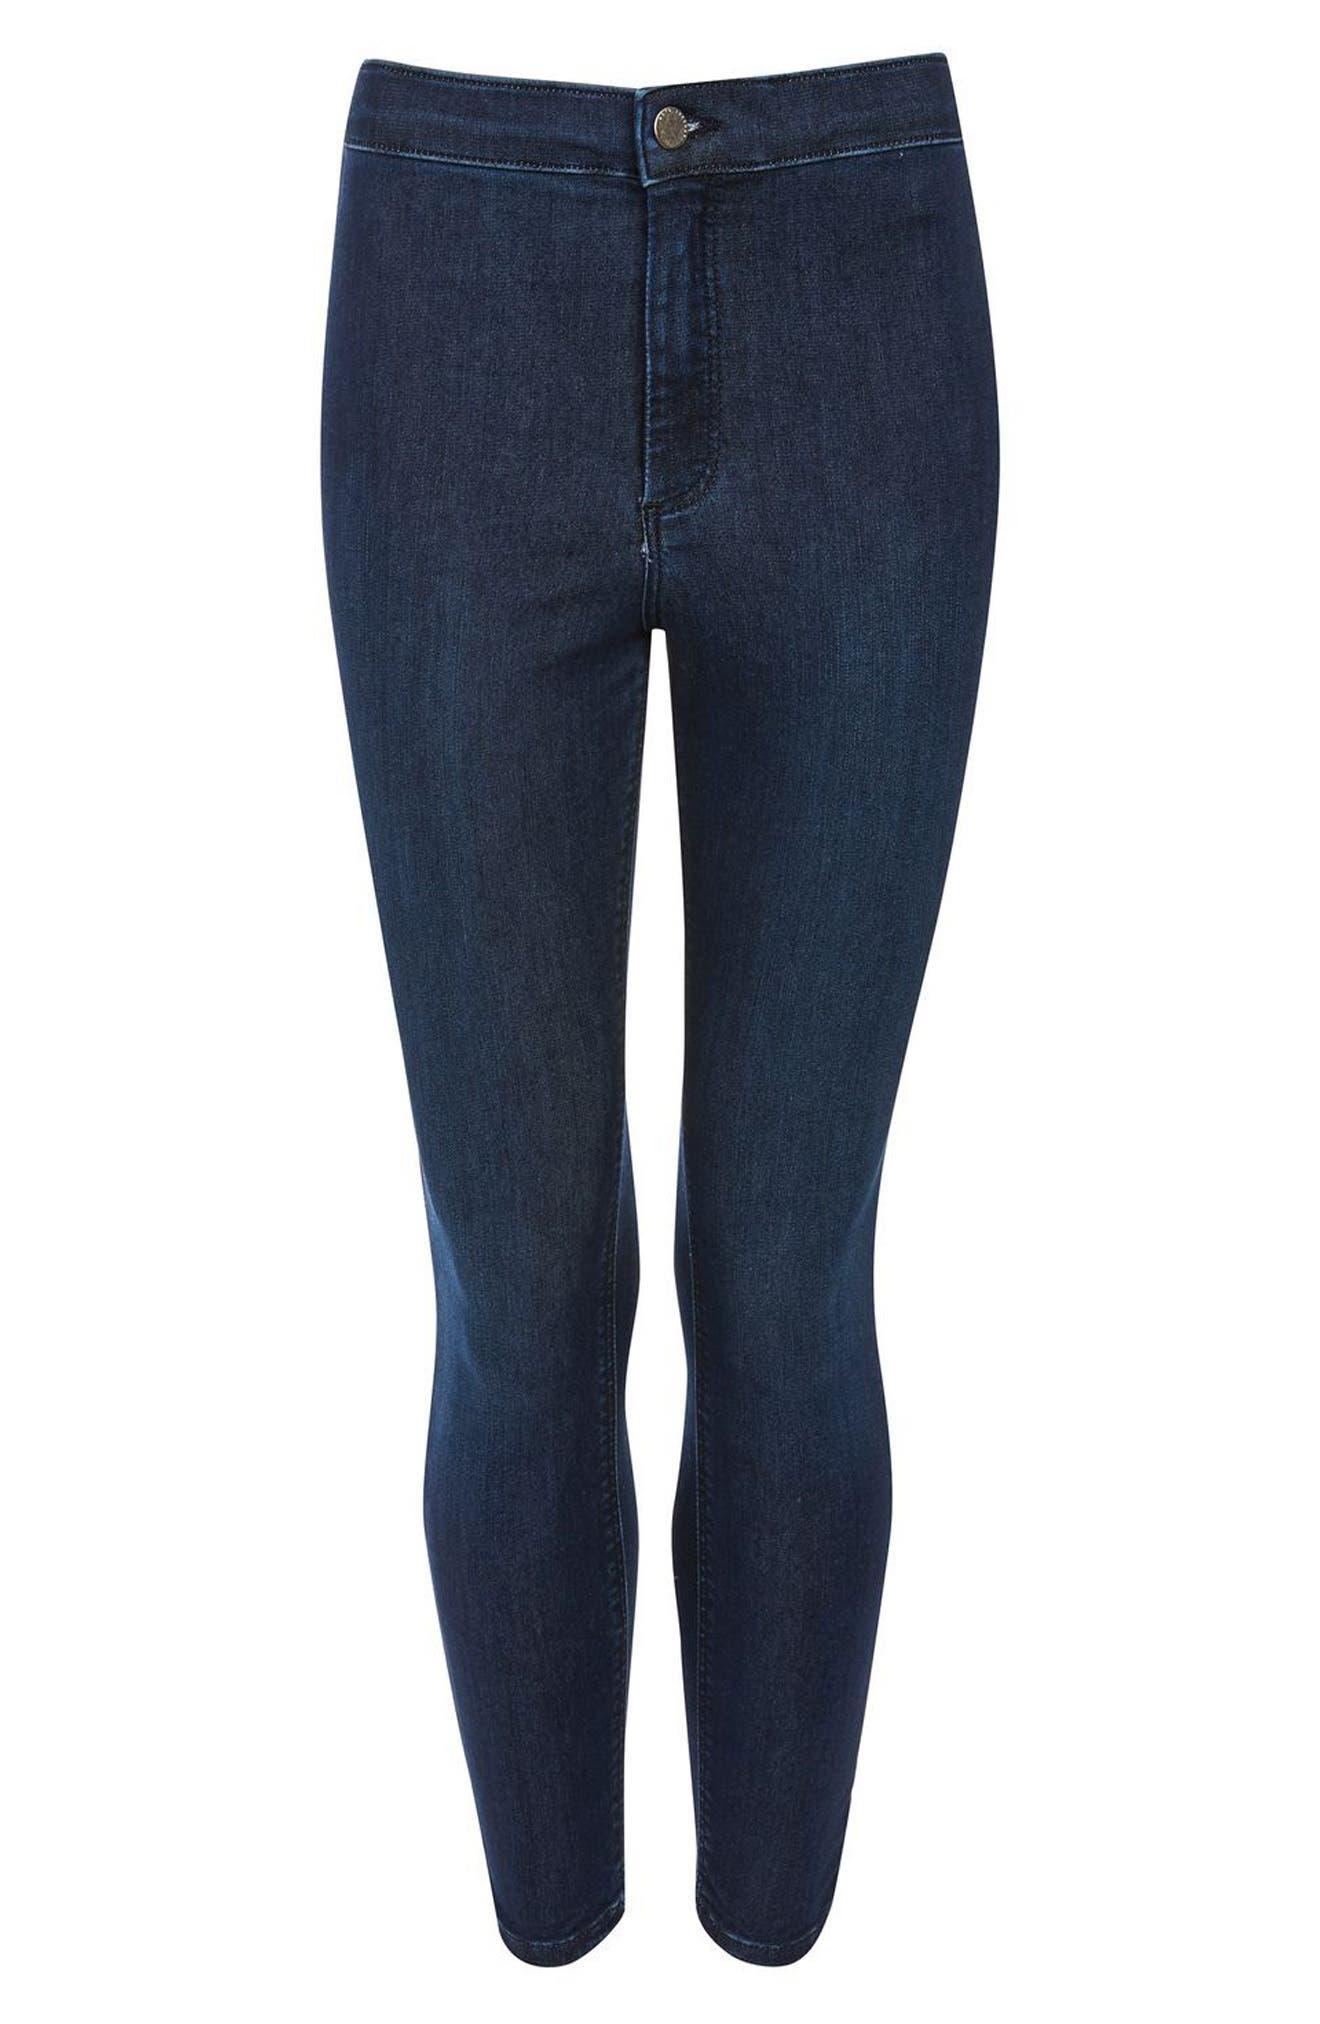 Alternate Image 3  - Topshop Joni High Waist Skinny Jeans (Petite)